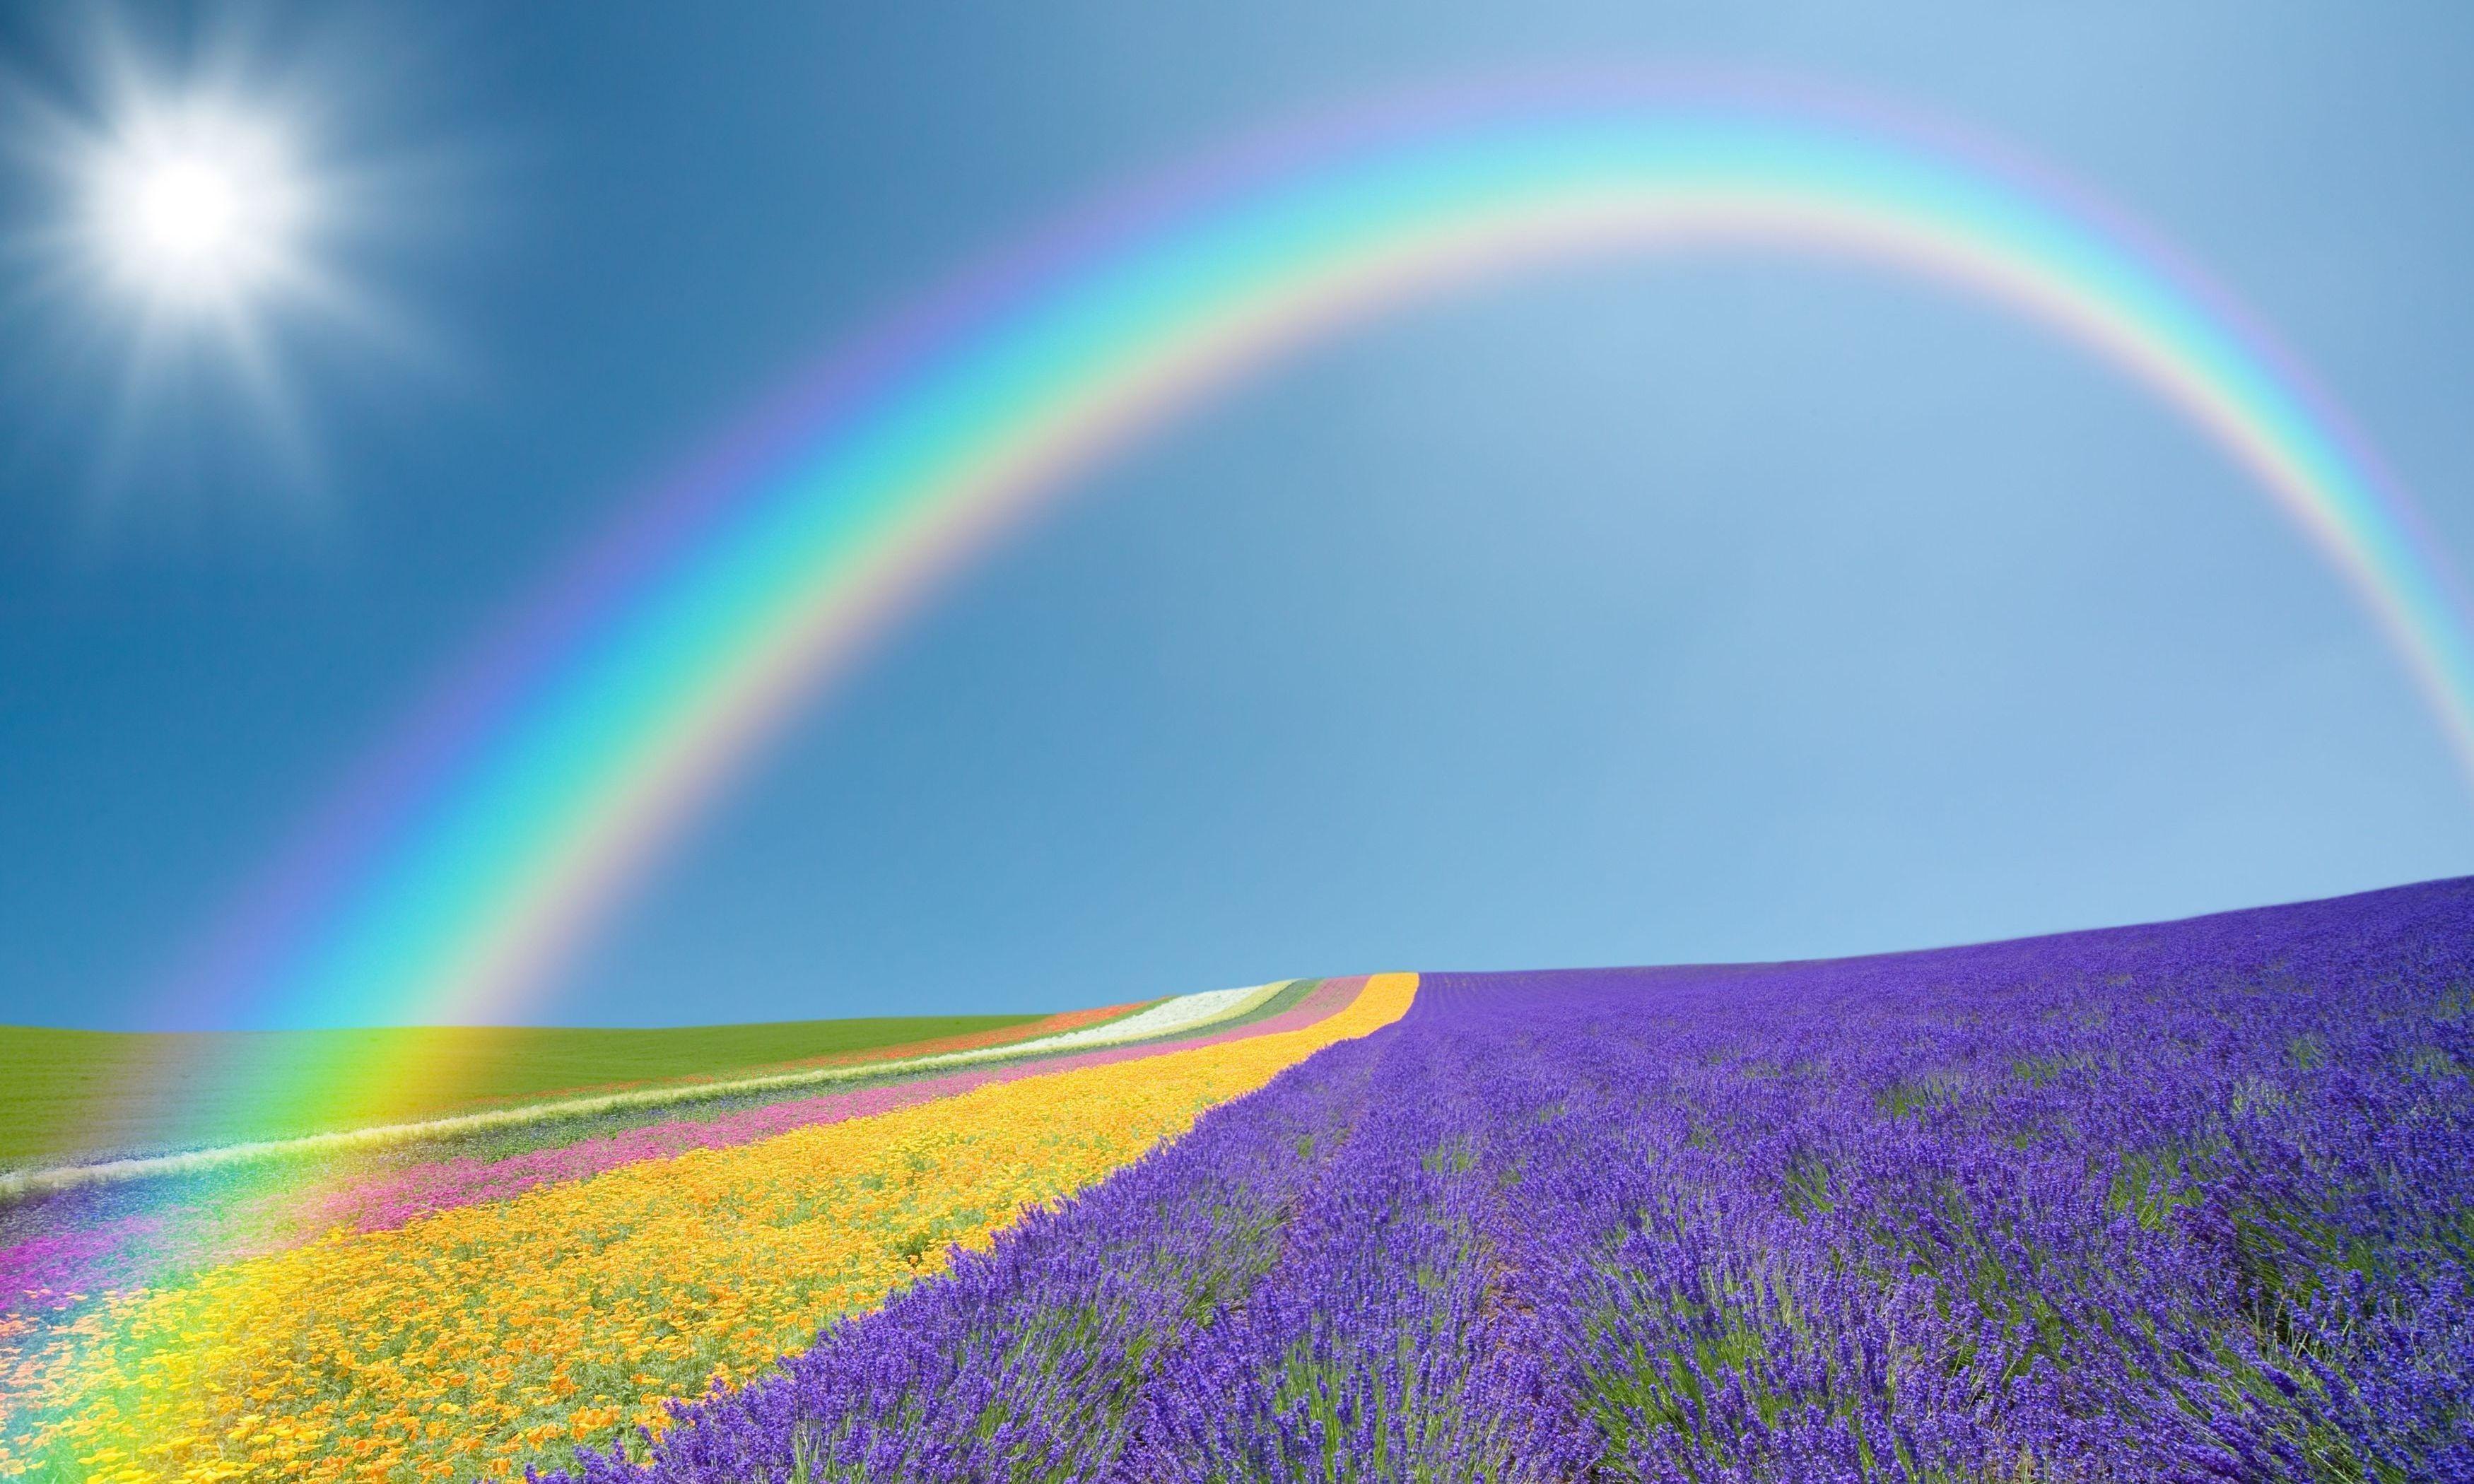 Top Wallpaper High Resolution Rainbow - 157714-beautiful-rainbow-background-tumblr-3500x2100-for-ipad-2  Picture_904310.jpg